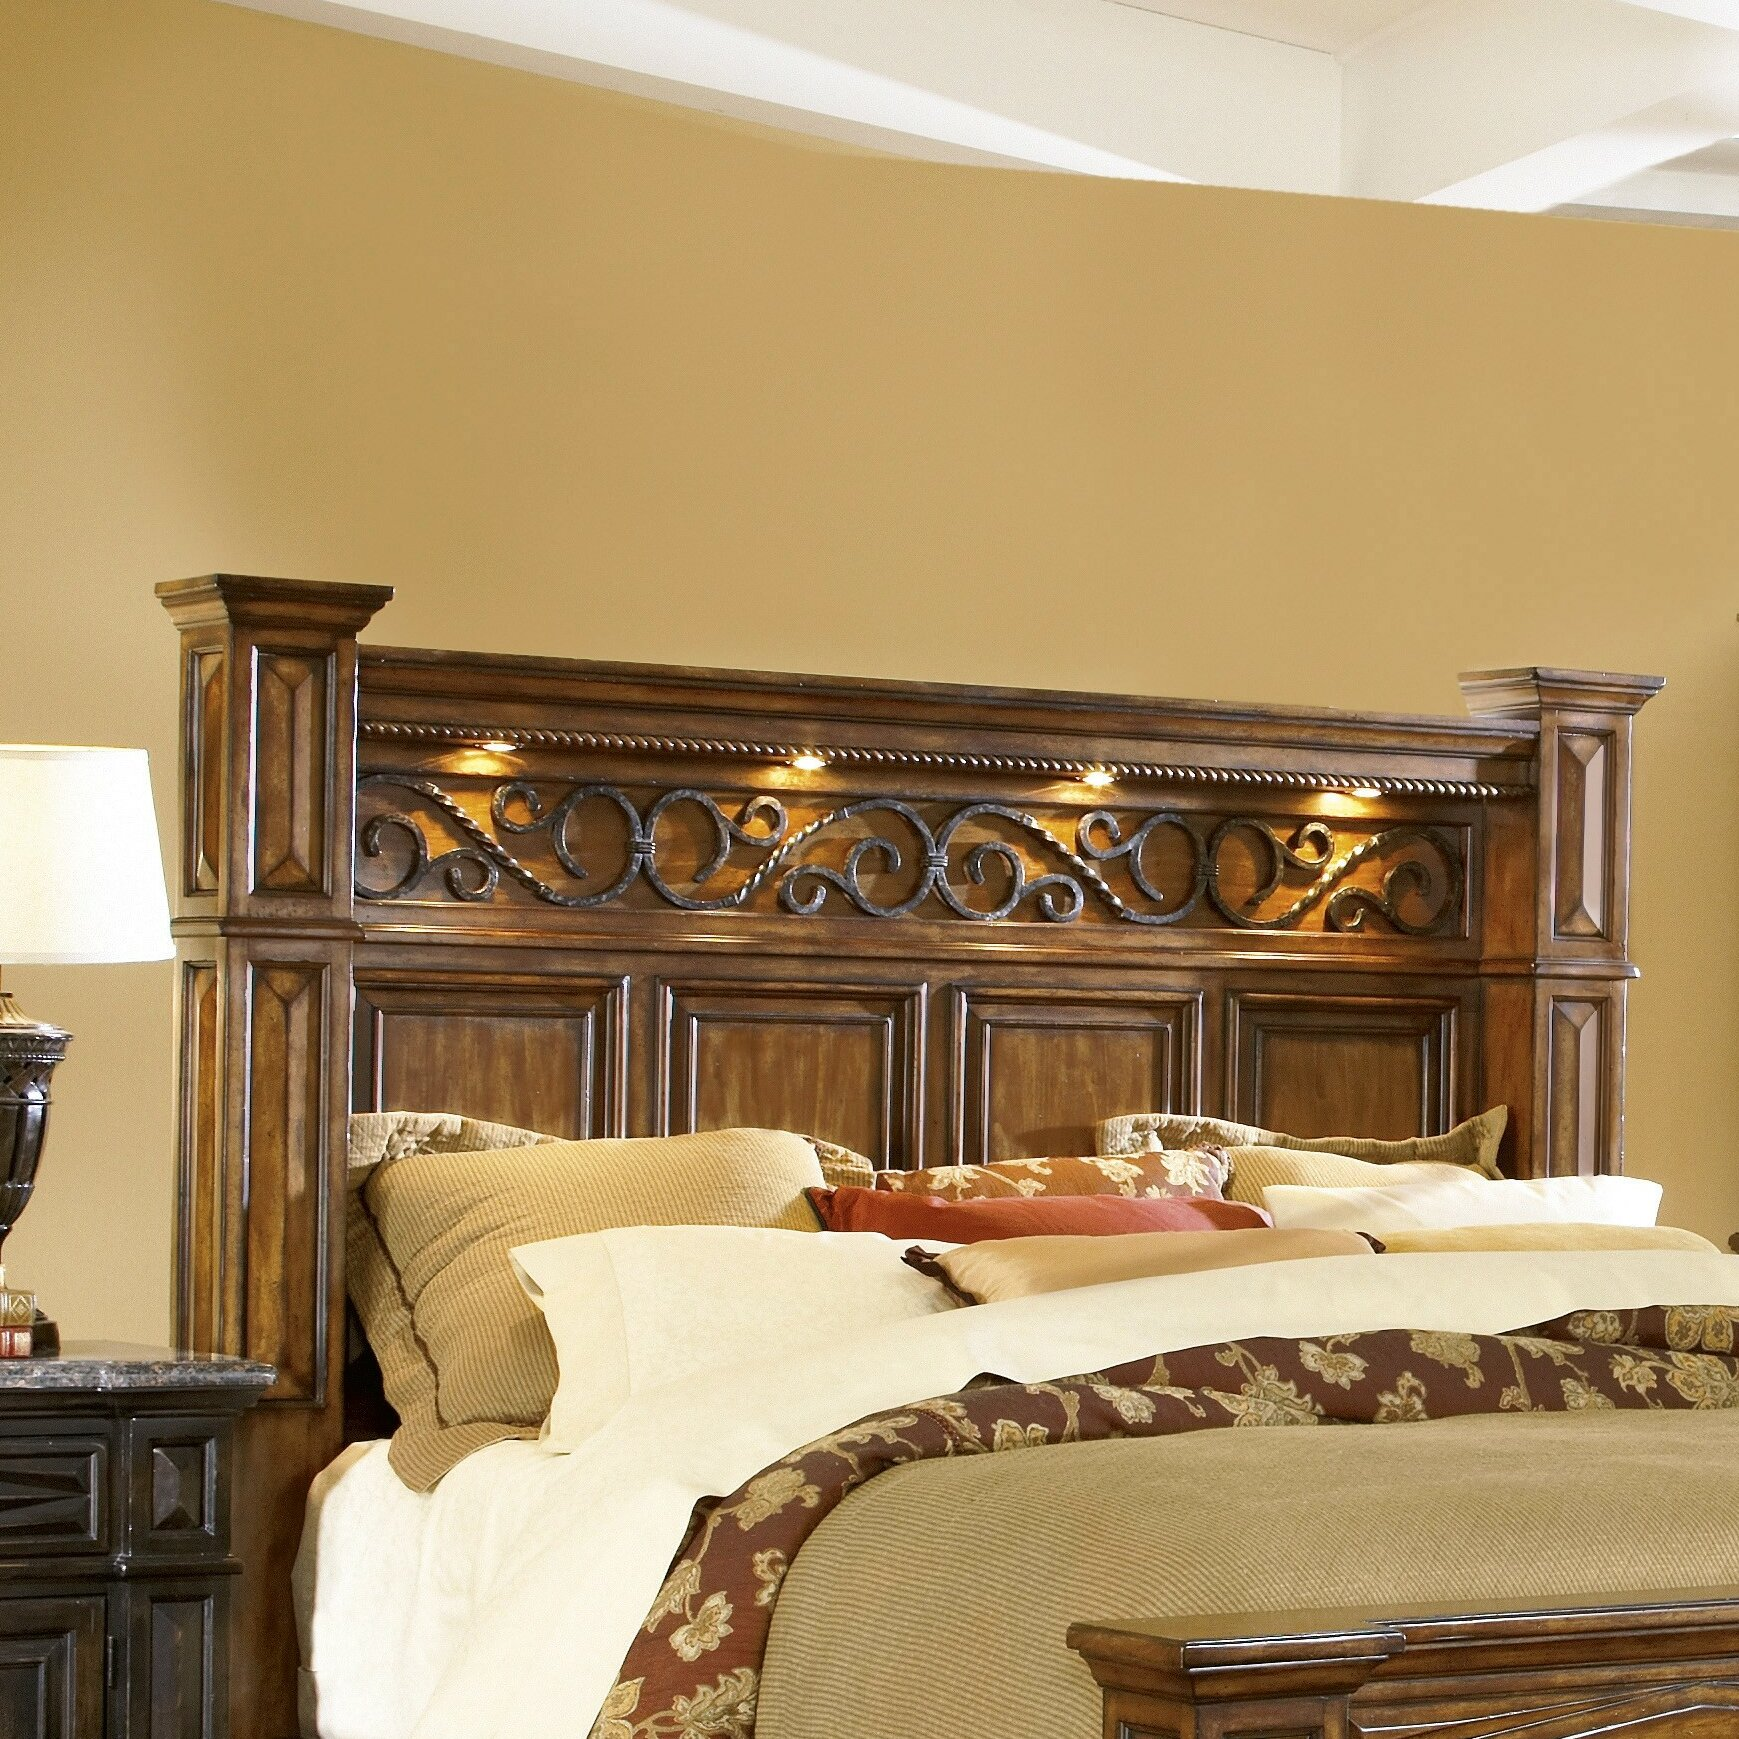 Grand bedroom furniture